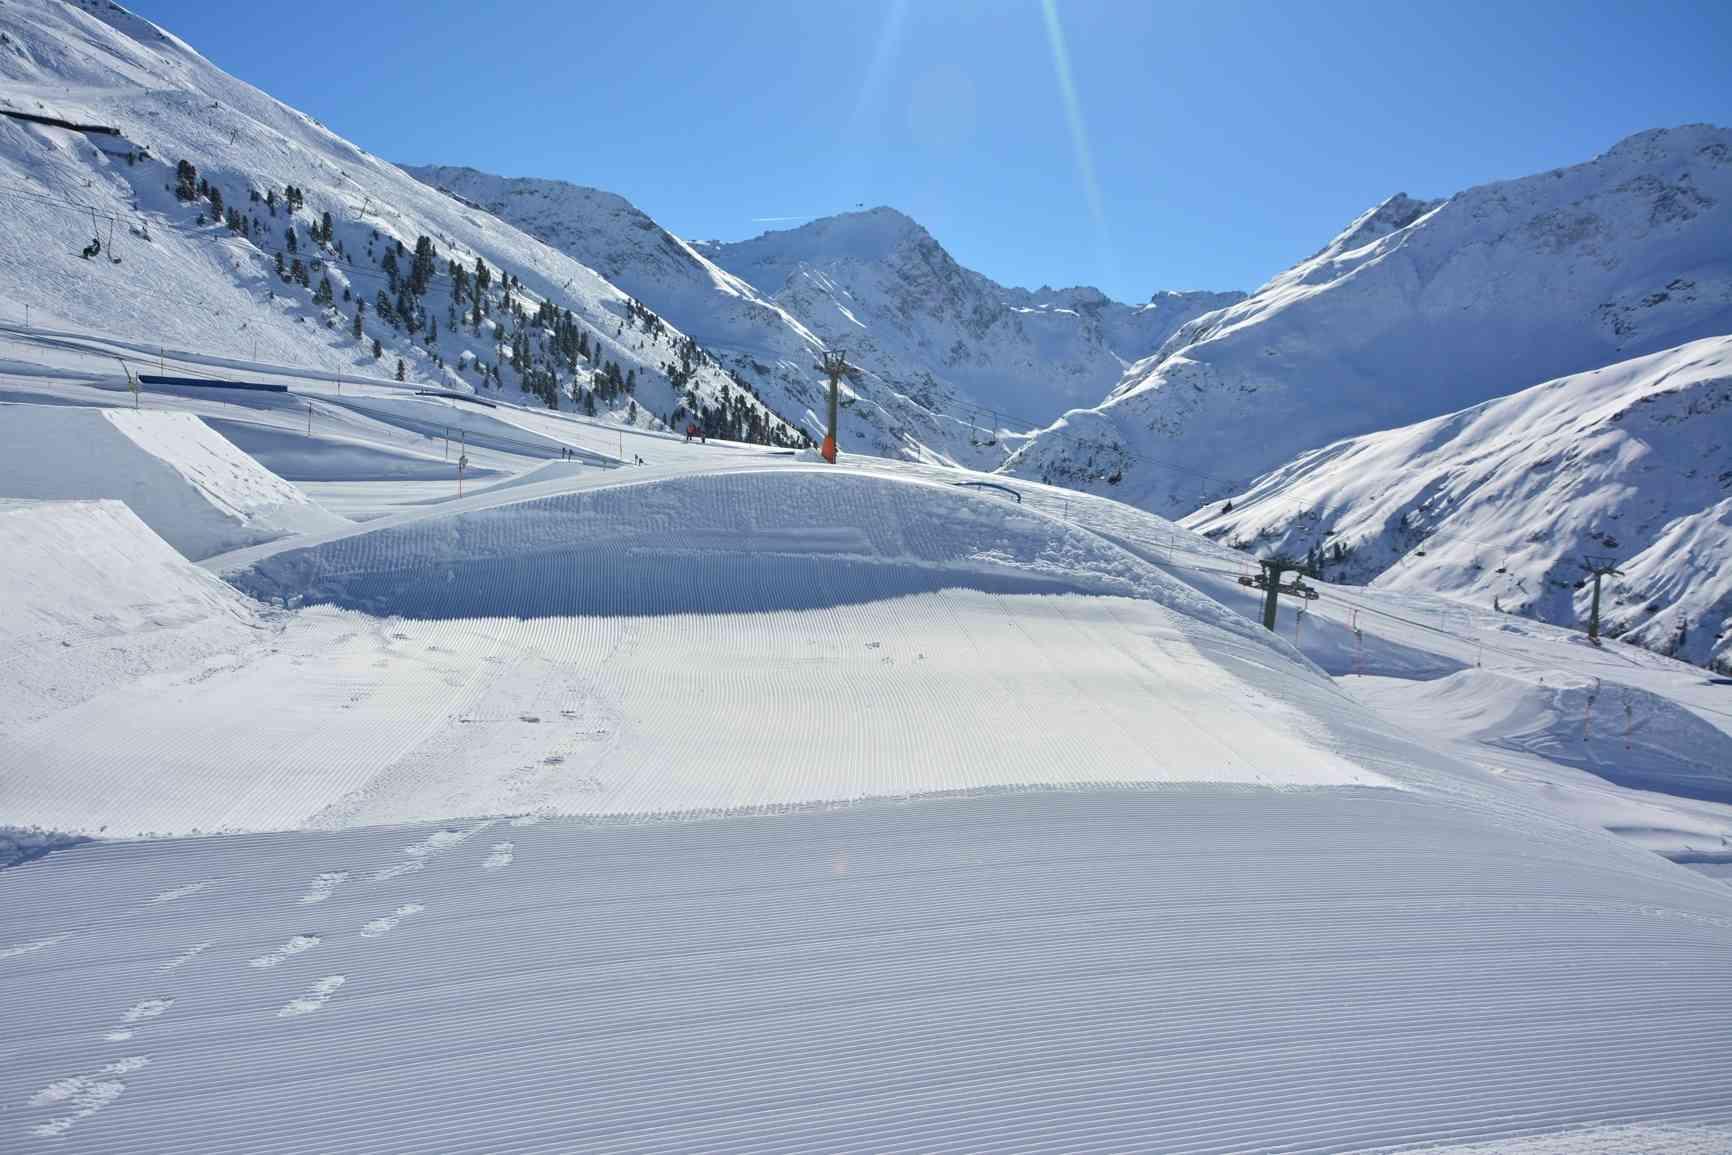 Pro Area Schnee-Elemente Knuckle Roller 8m